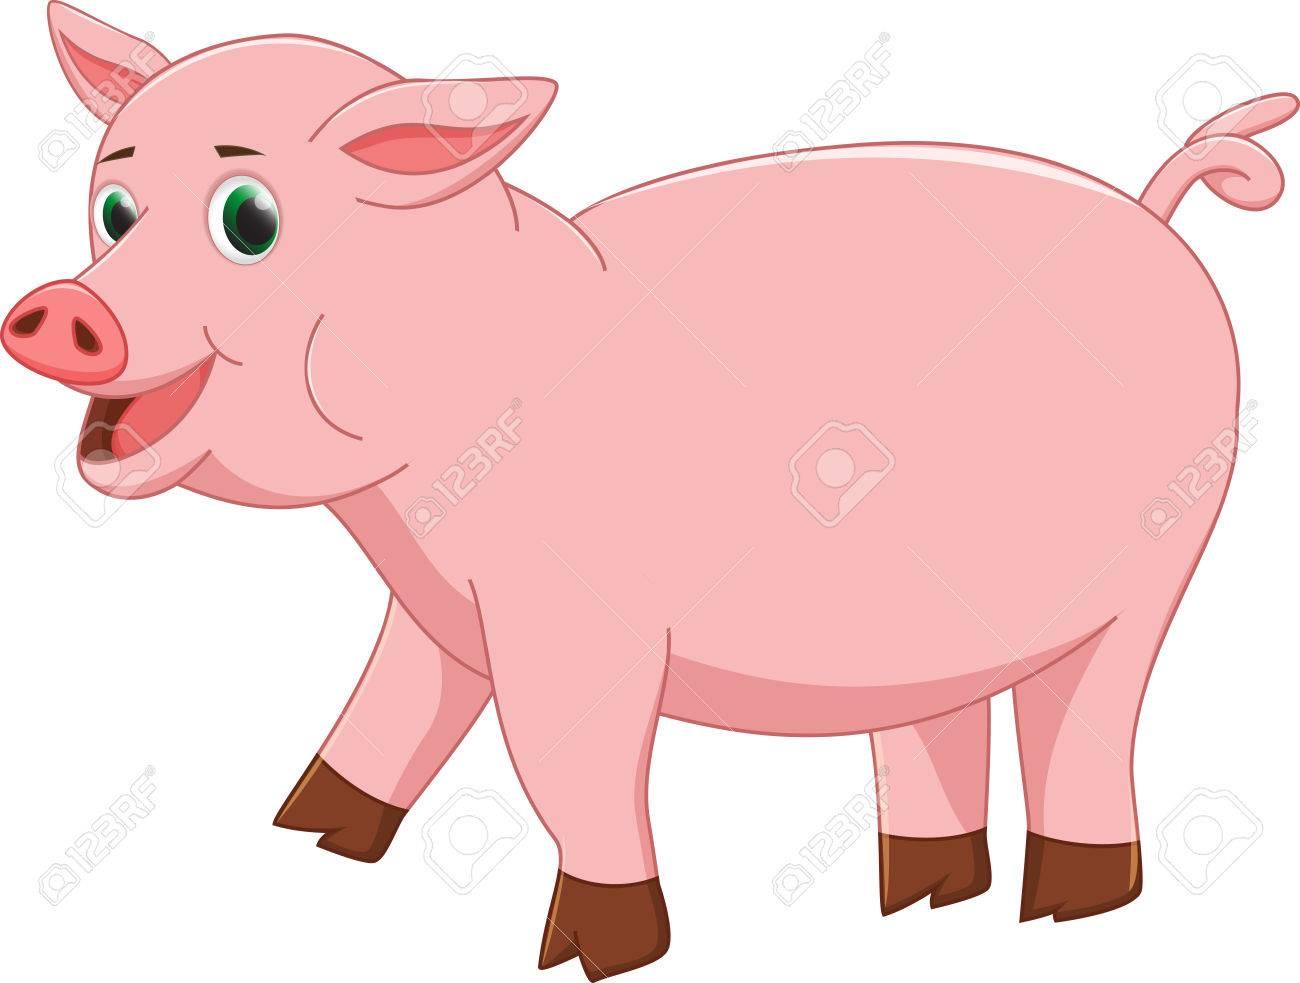 1300x983 Cute Pig Cartoon Royalty Free Cliparts, Vectors, And Stock